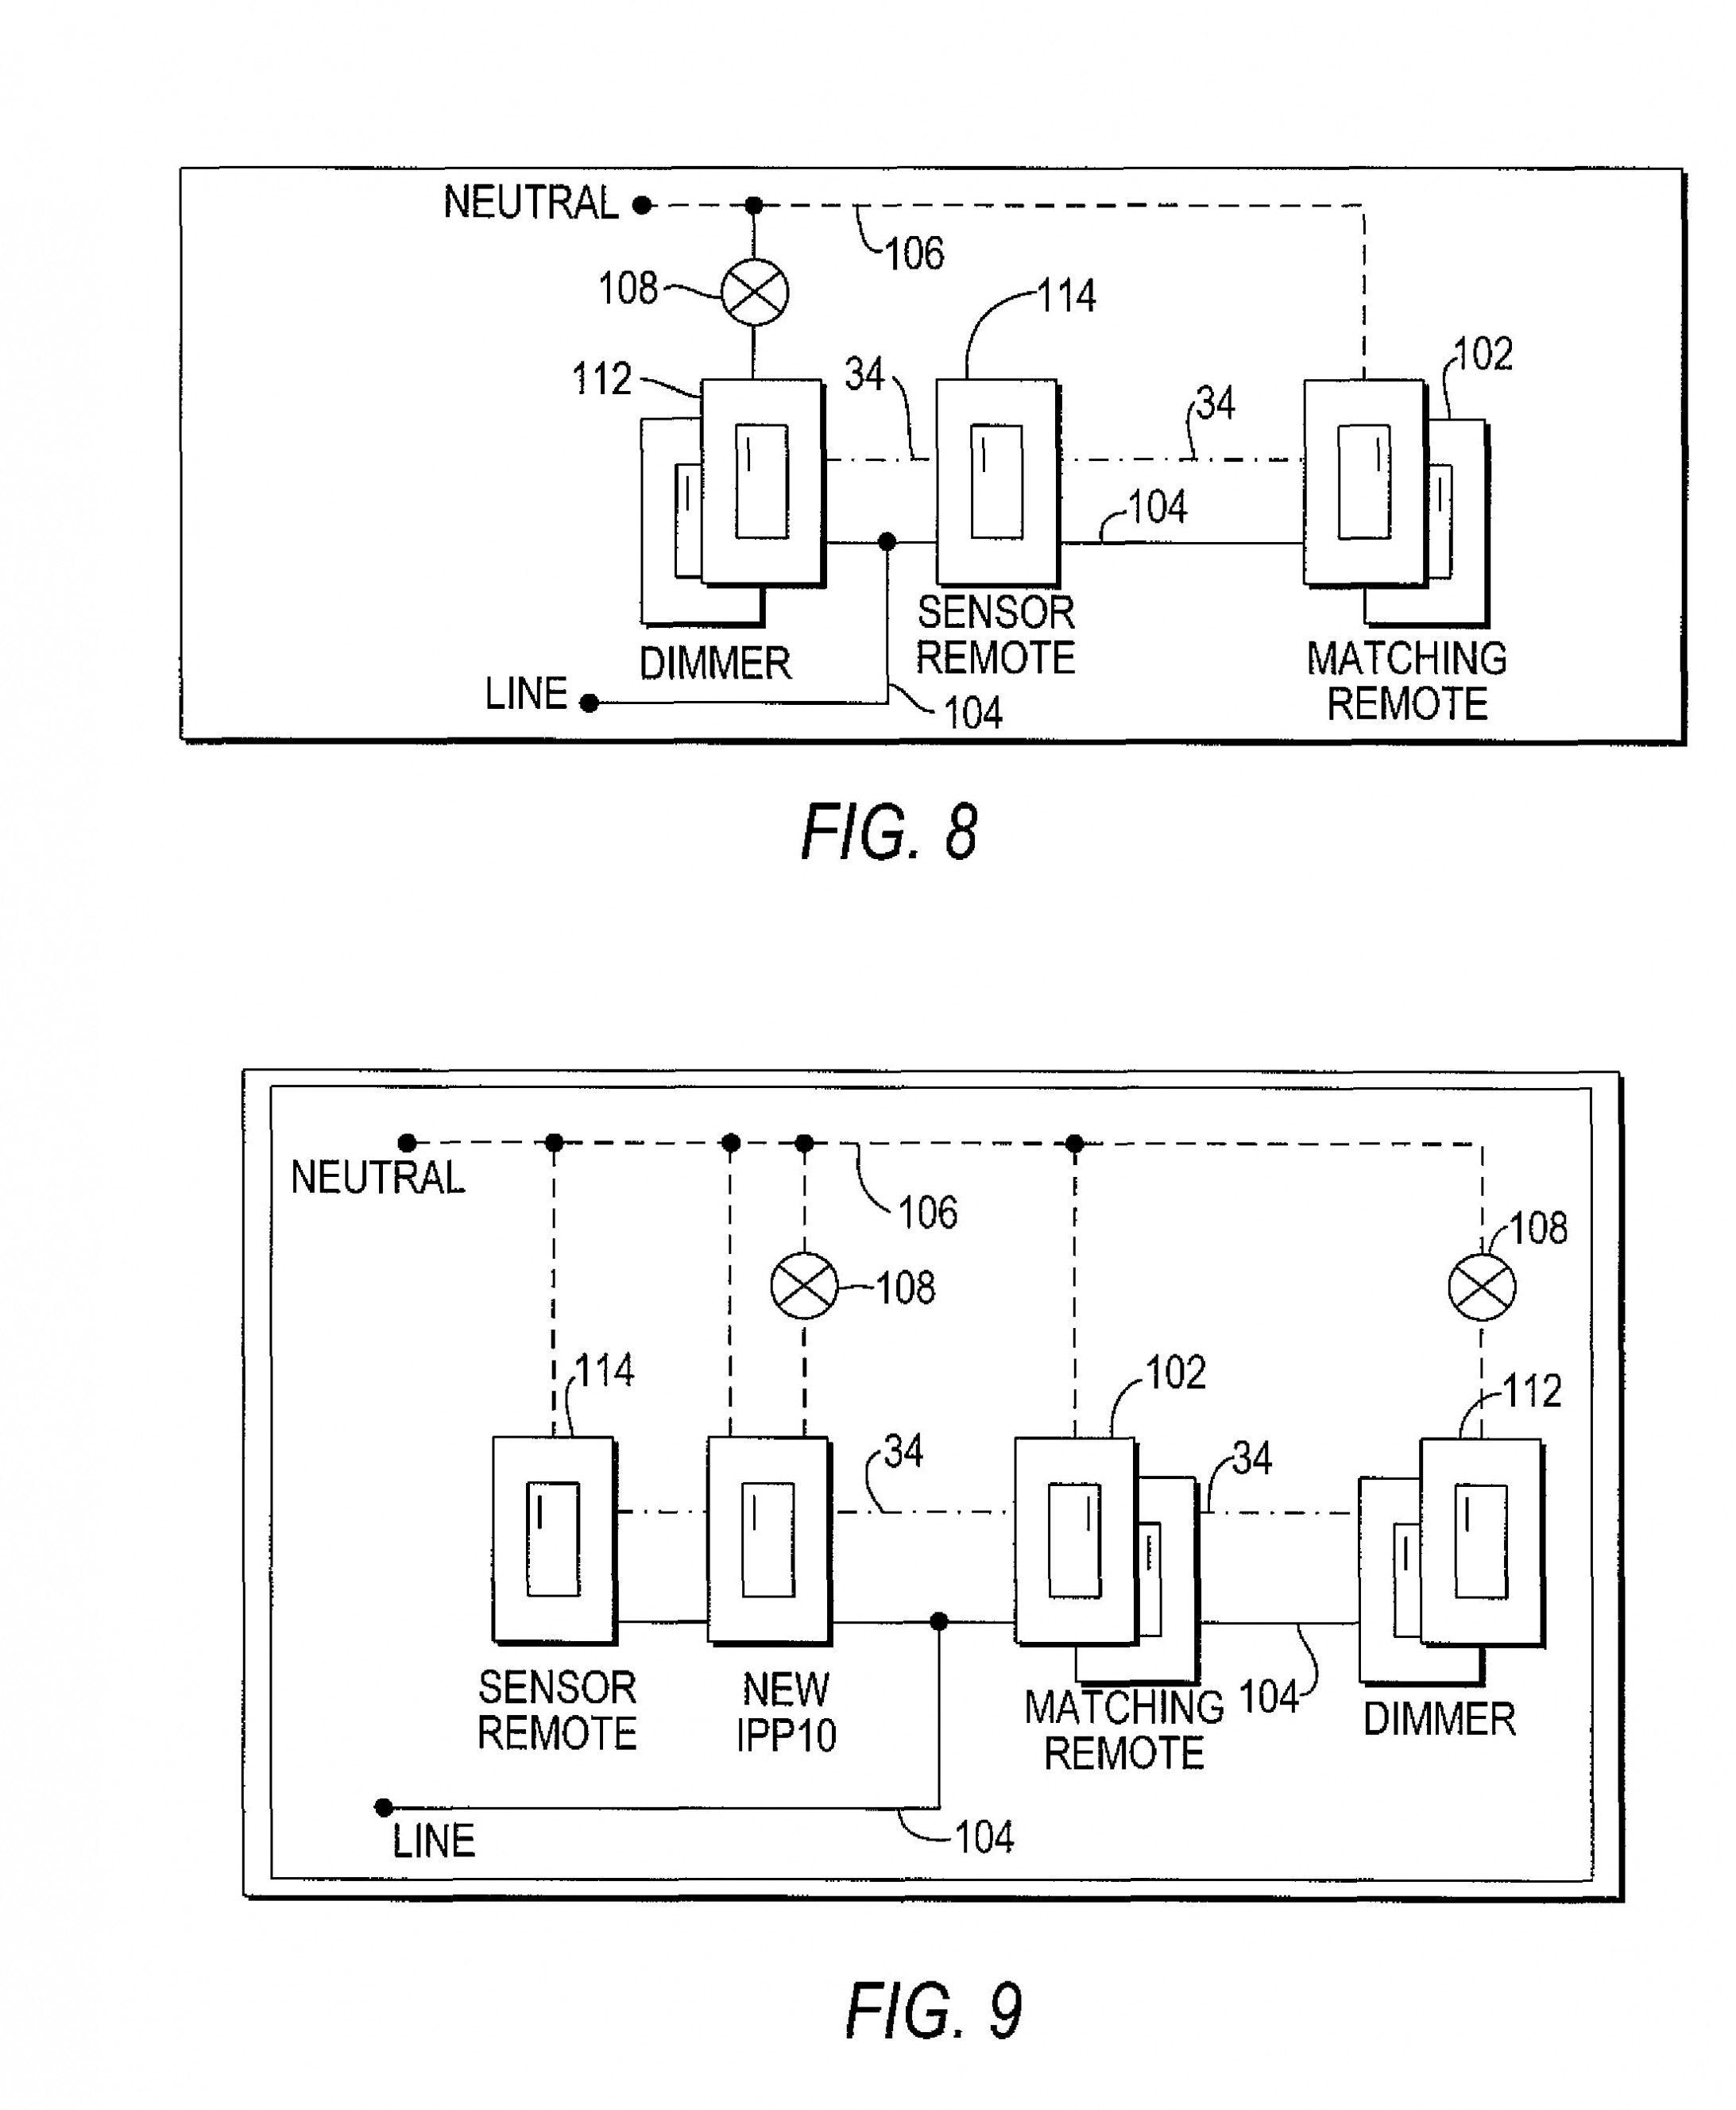 Unique Wiring Diagram For A Leviton Dimmer Switch Diagram Diagramtemplate Diagramsample Electrica